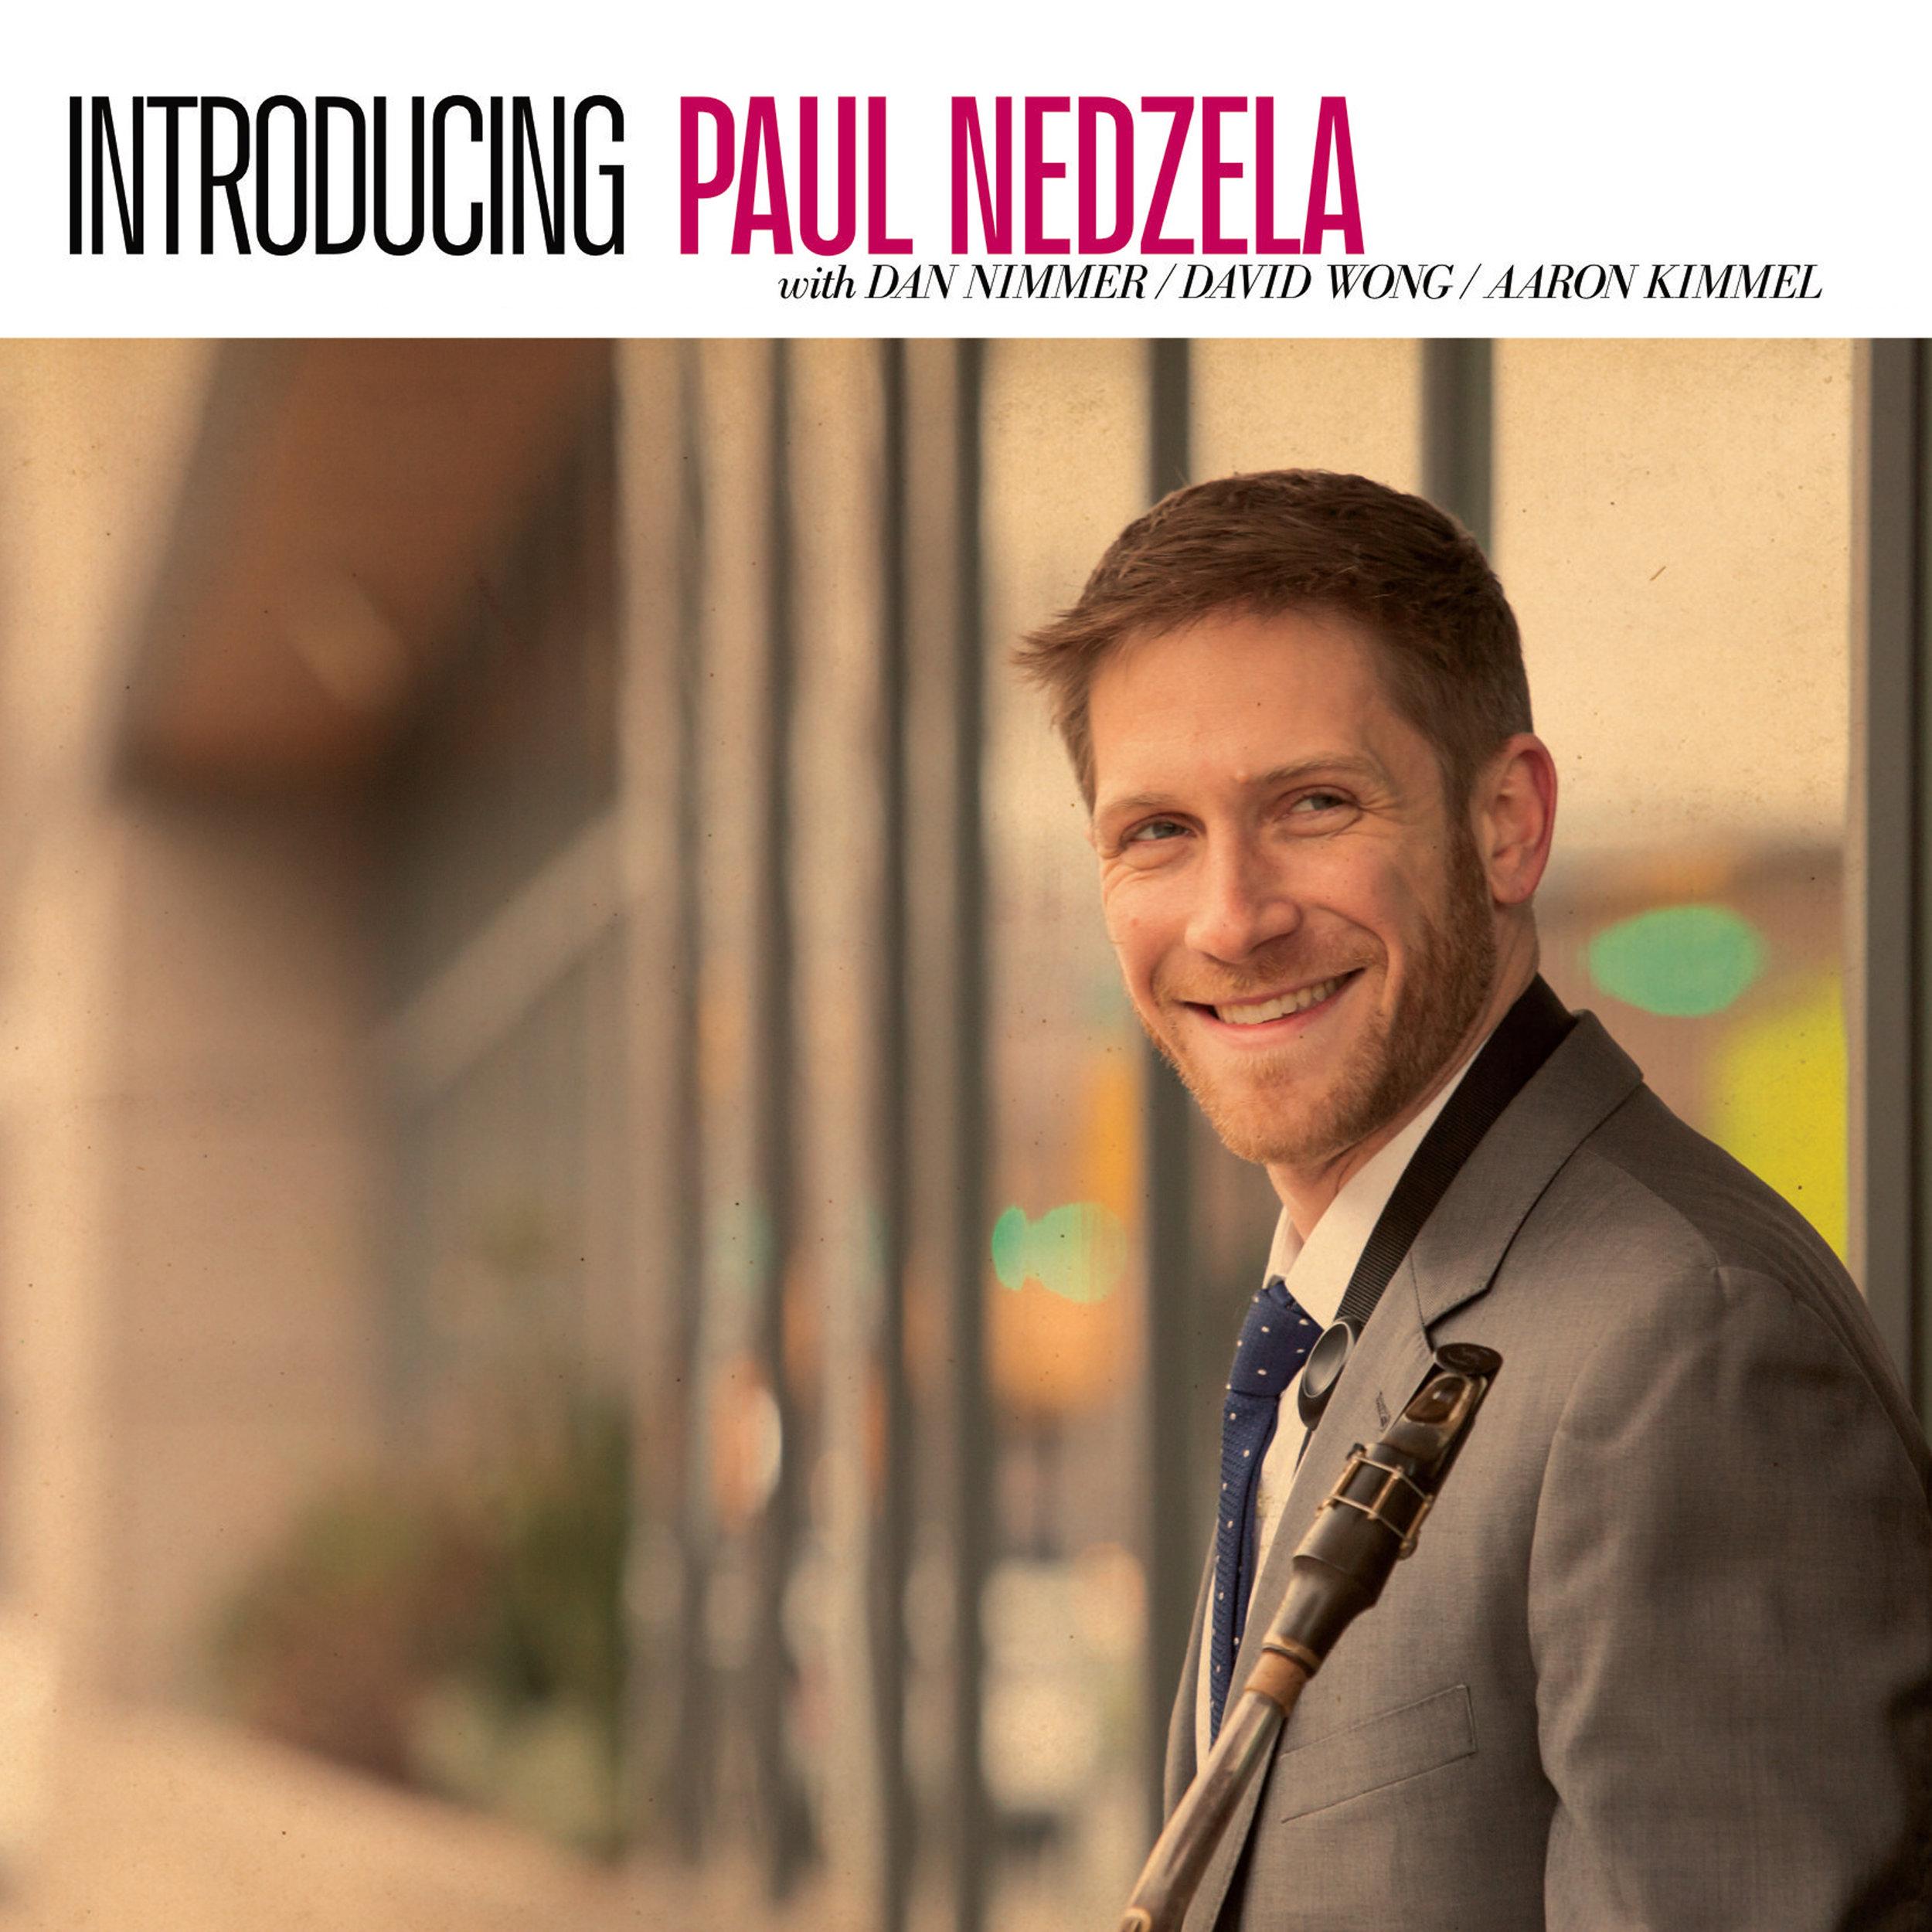 Introducing Paul Nedzela Album Cover.jpg